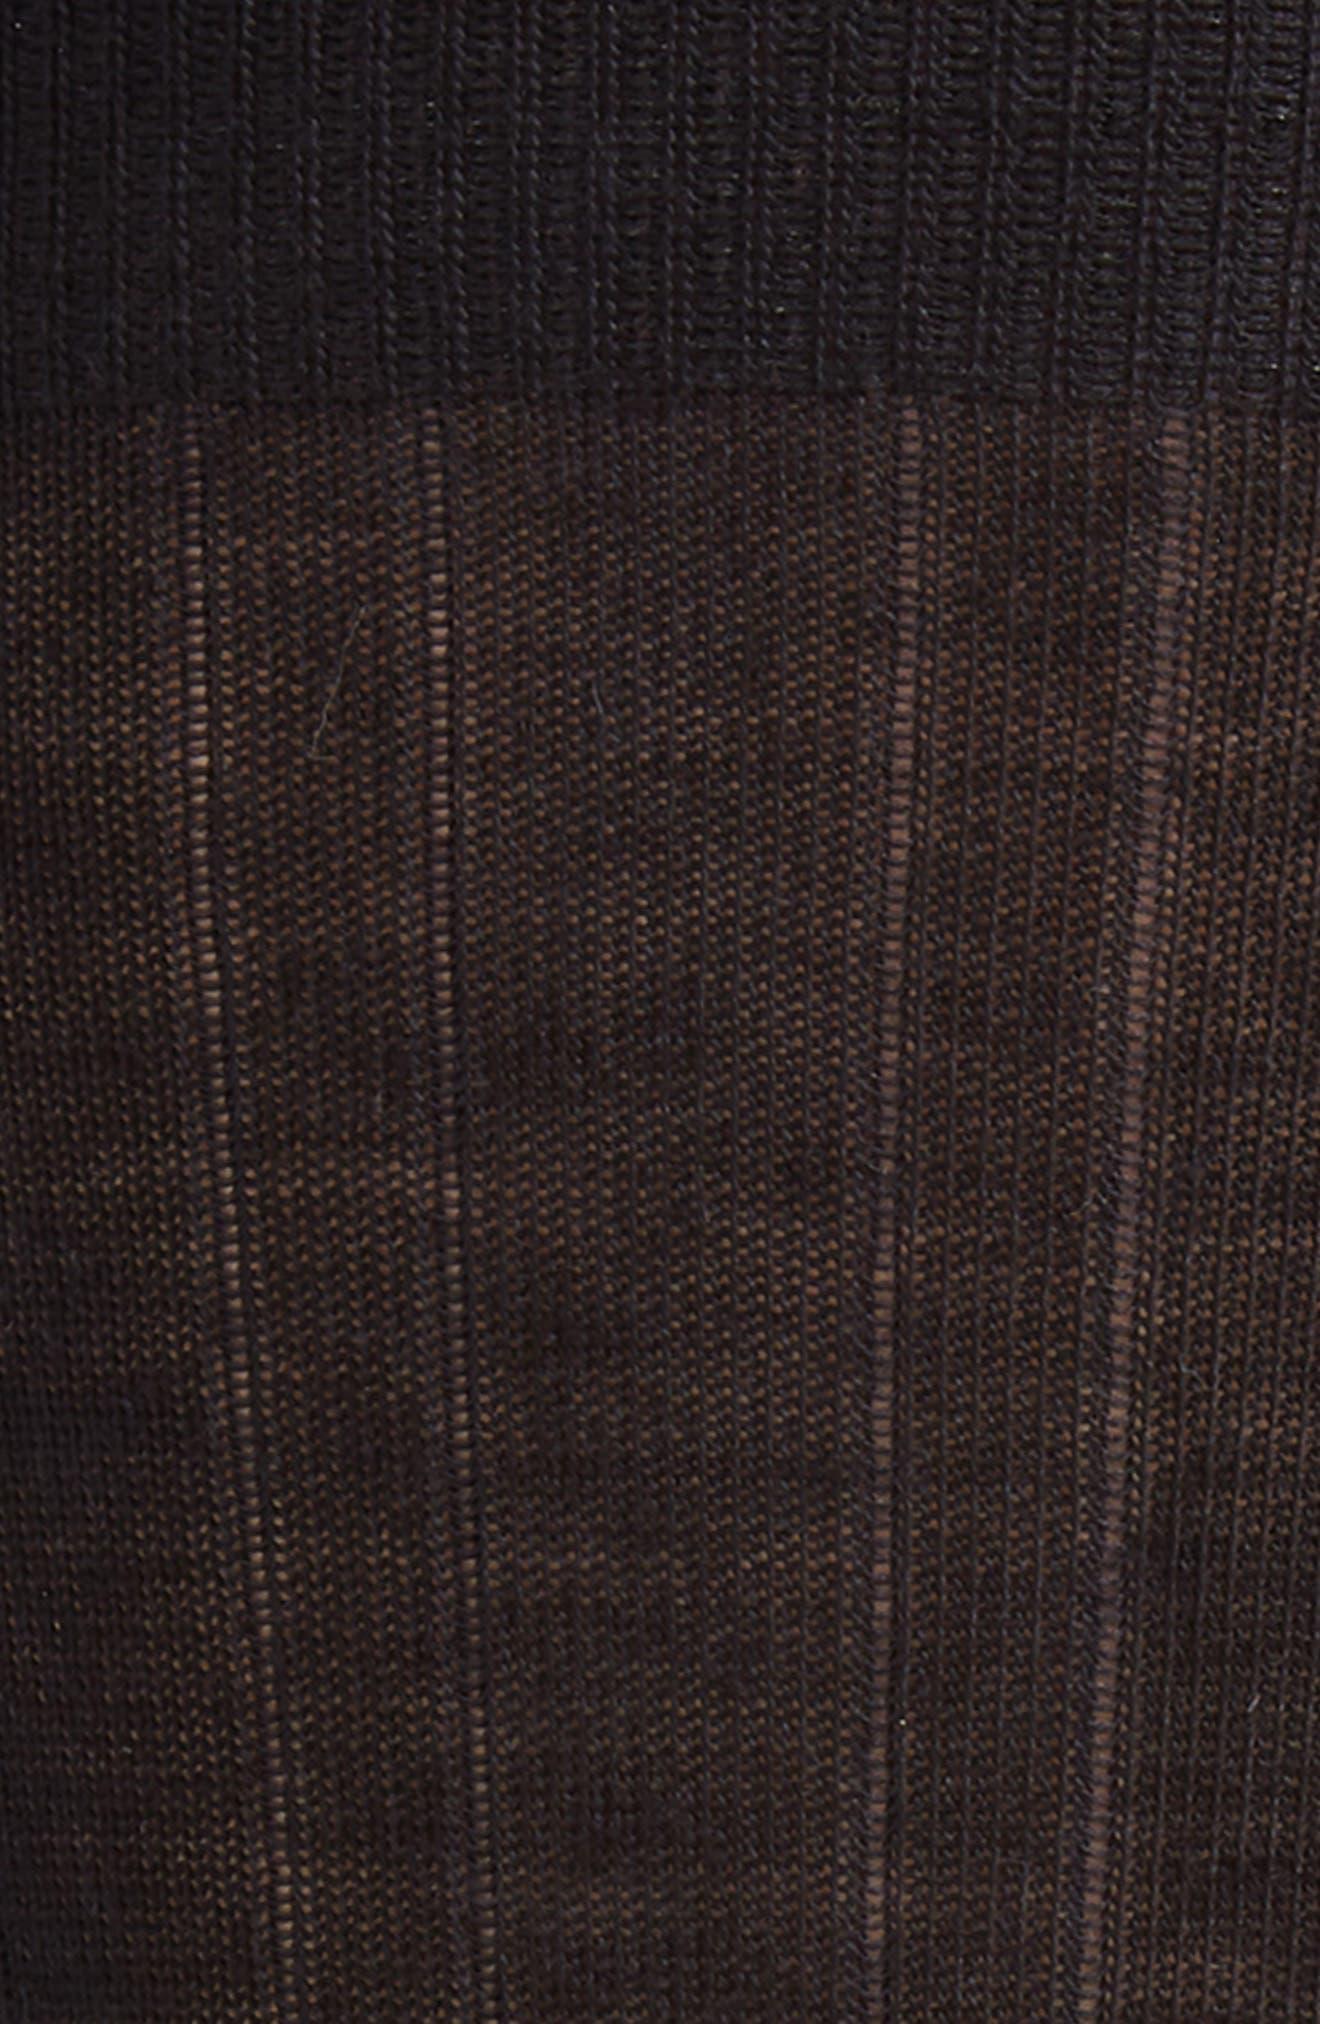 Solid Merino Wool Blend Socks,                             Alternate thumbnail 2, color,                             BLACK